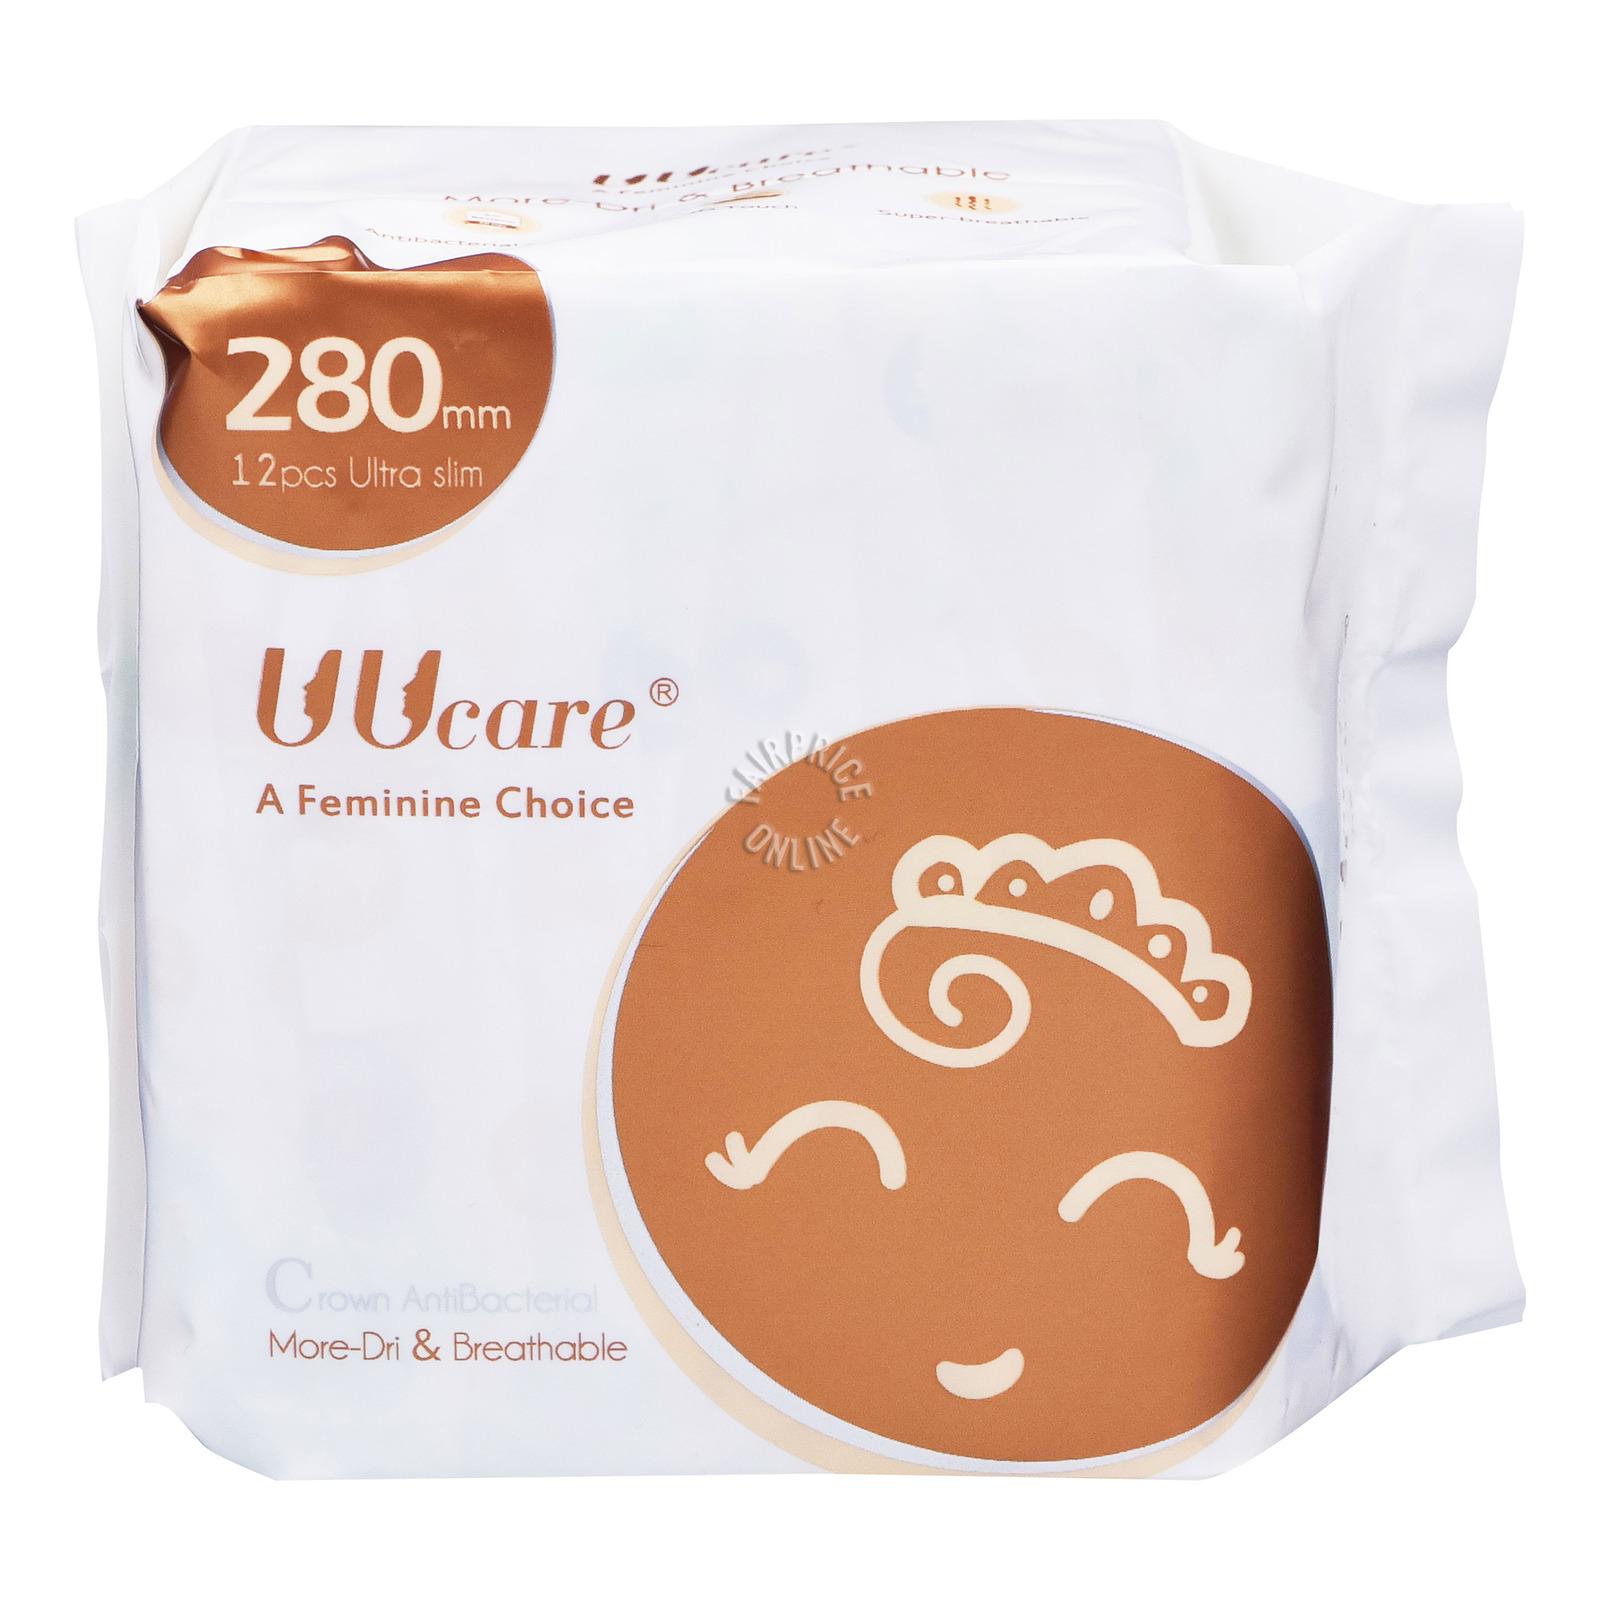 UU Care Crown Antibacterial Sanitary Wing Pads - 28cm